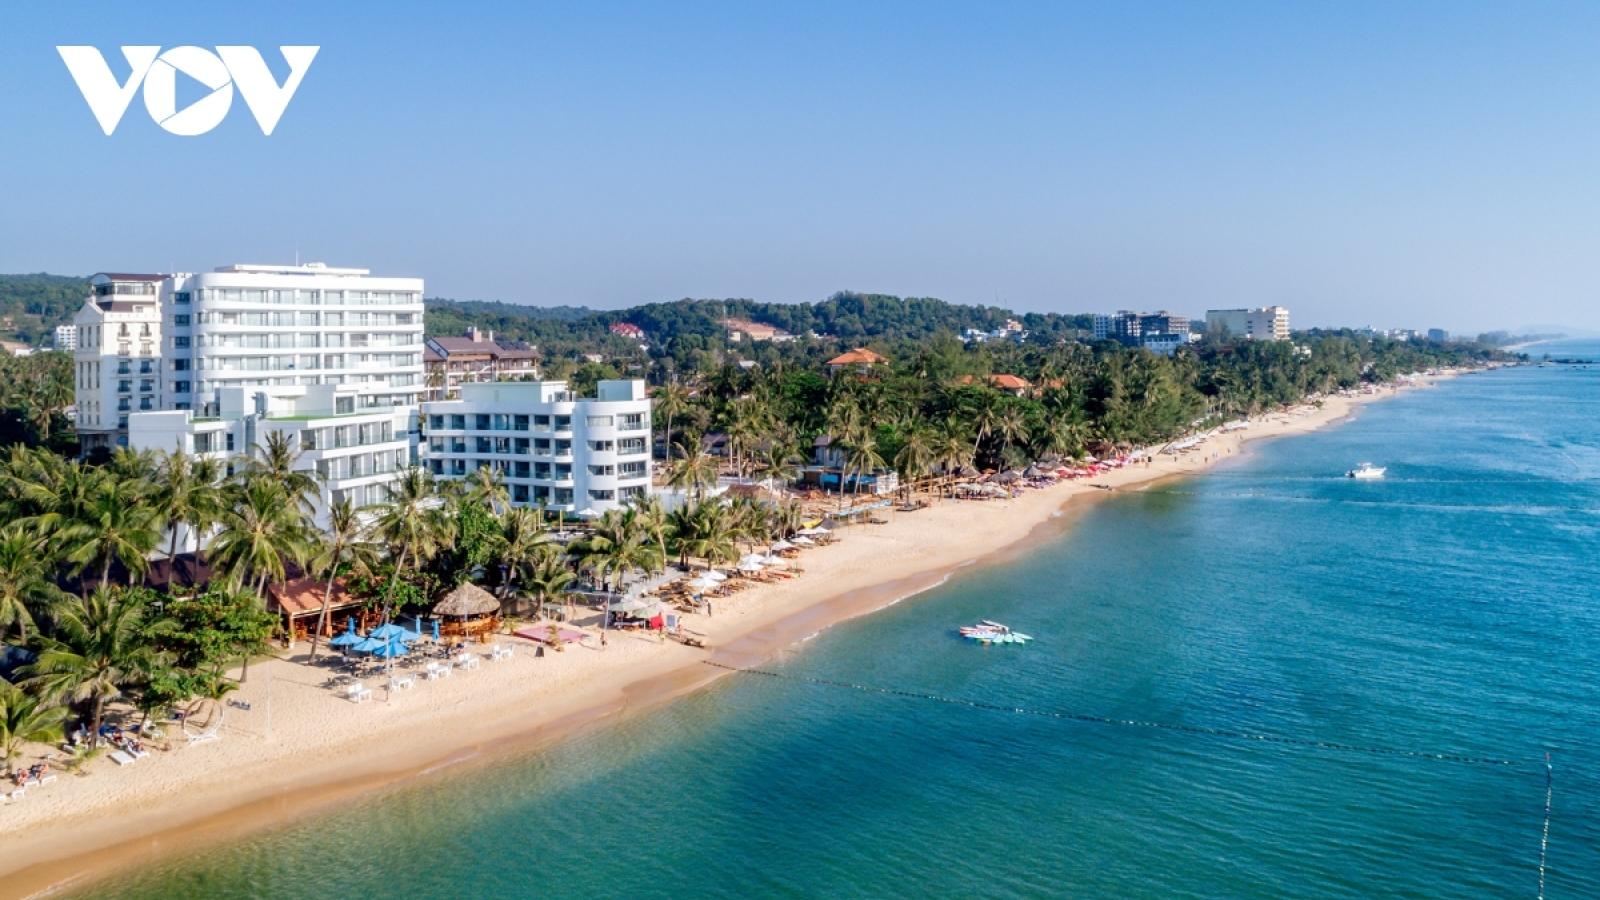 Phu Quoc resort paradise prepared to receive vaccinated visitors